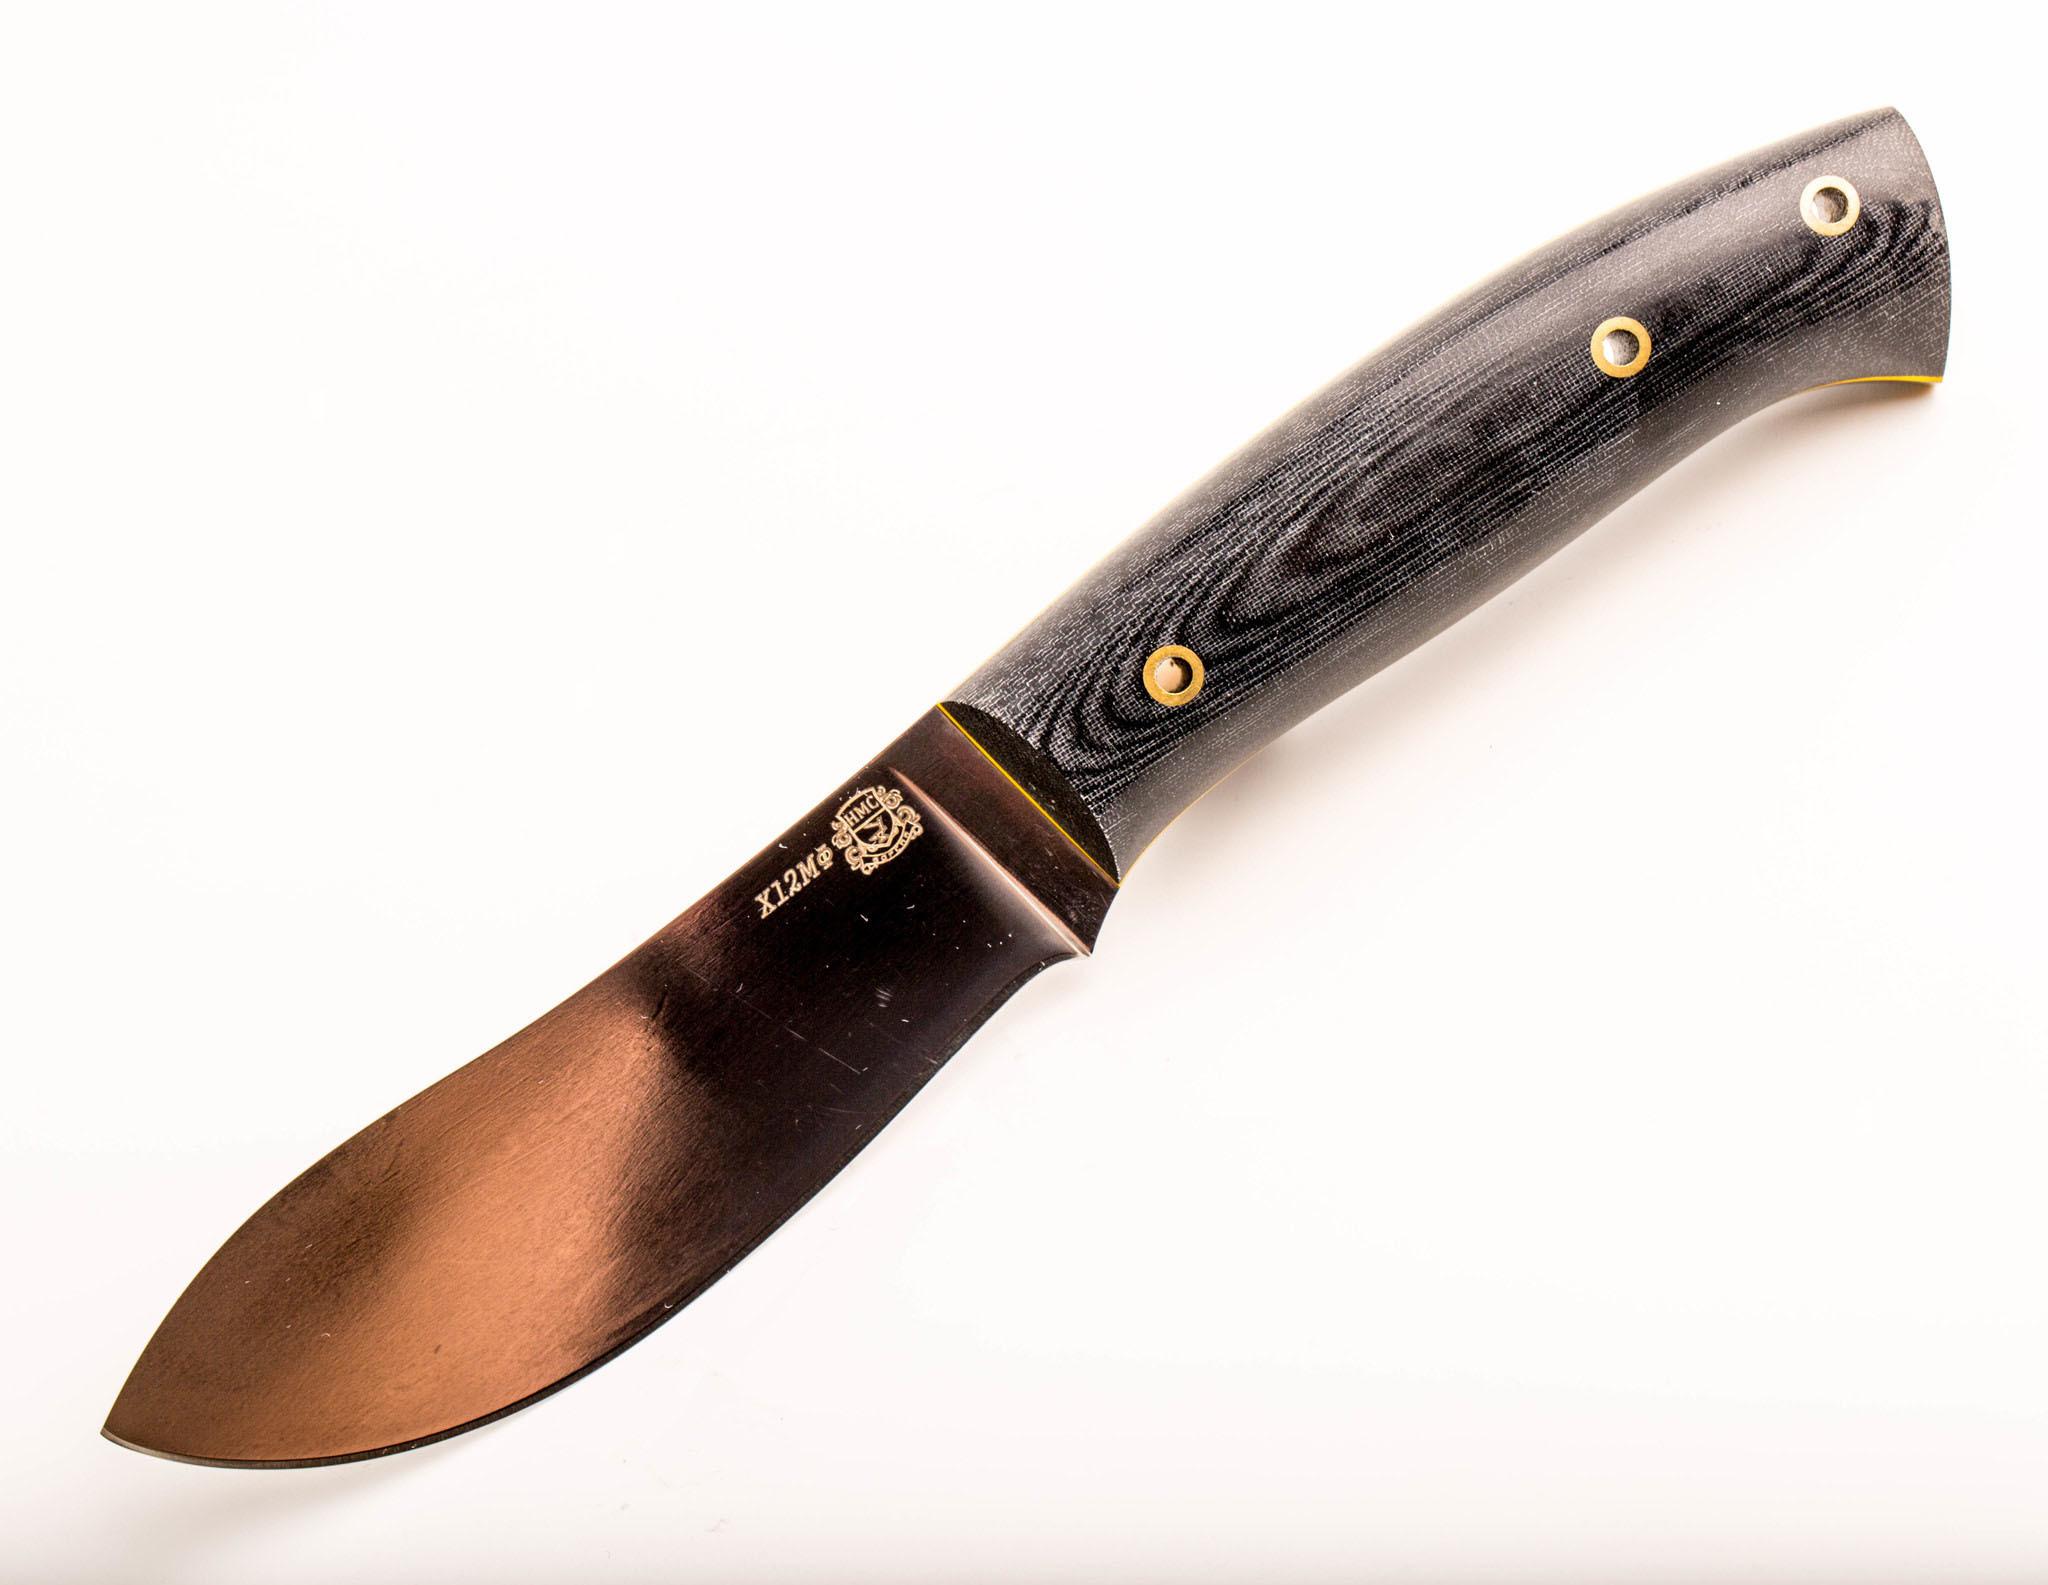 Нож цельнометаллический F6, сталь Х12МФ